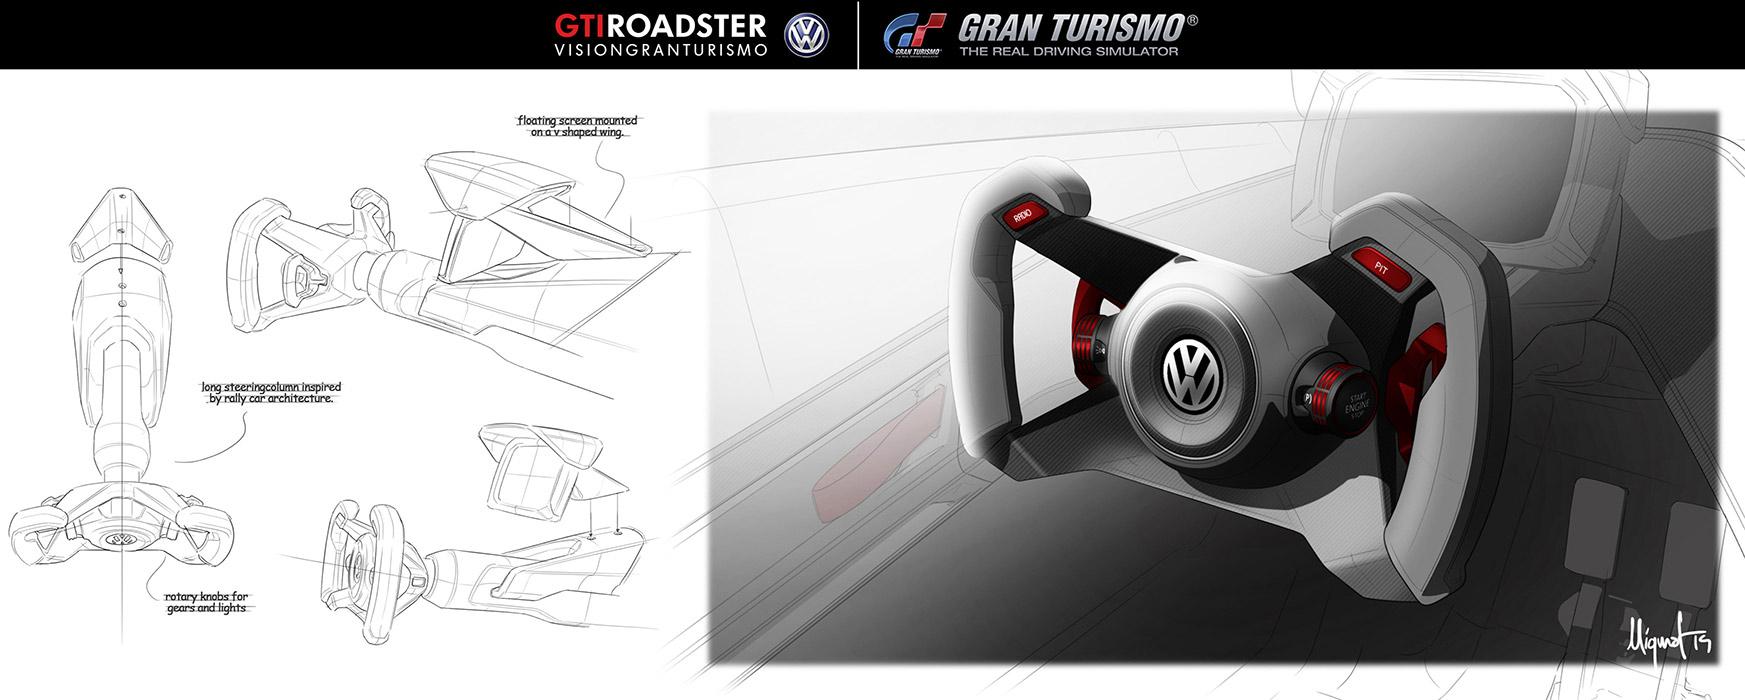 volkswagen-design-vision-gti-gran-turismo-012